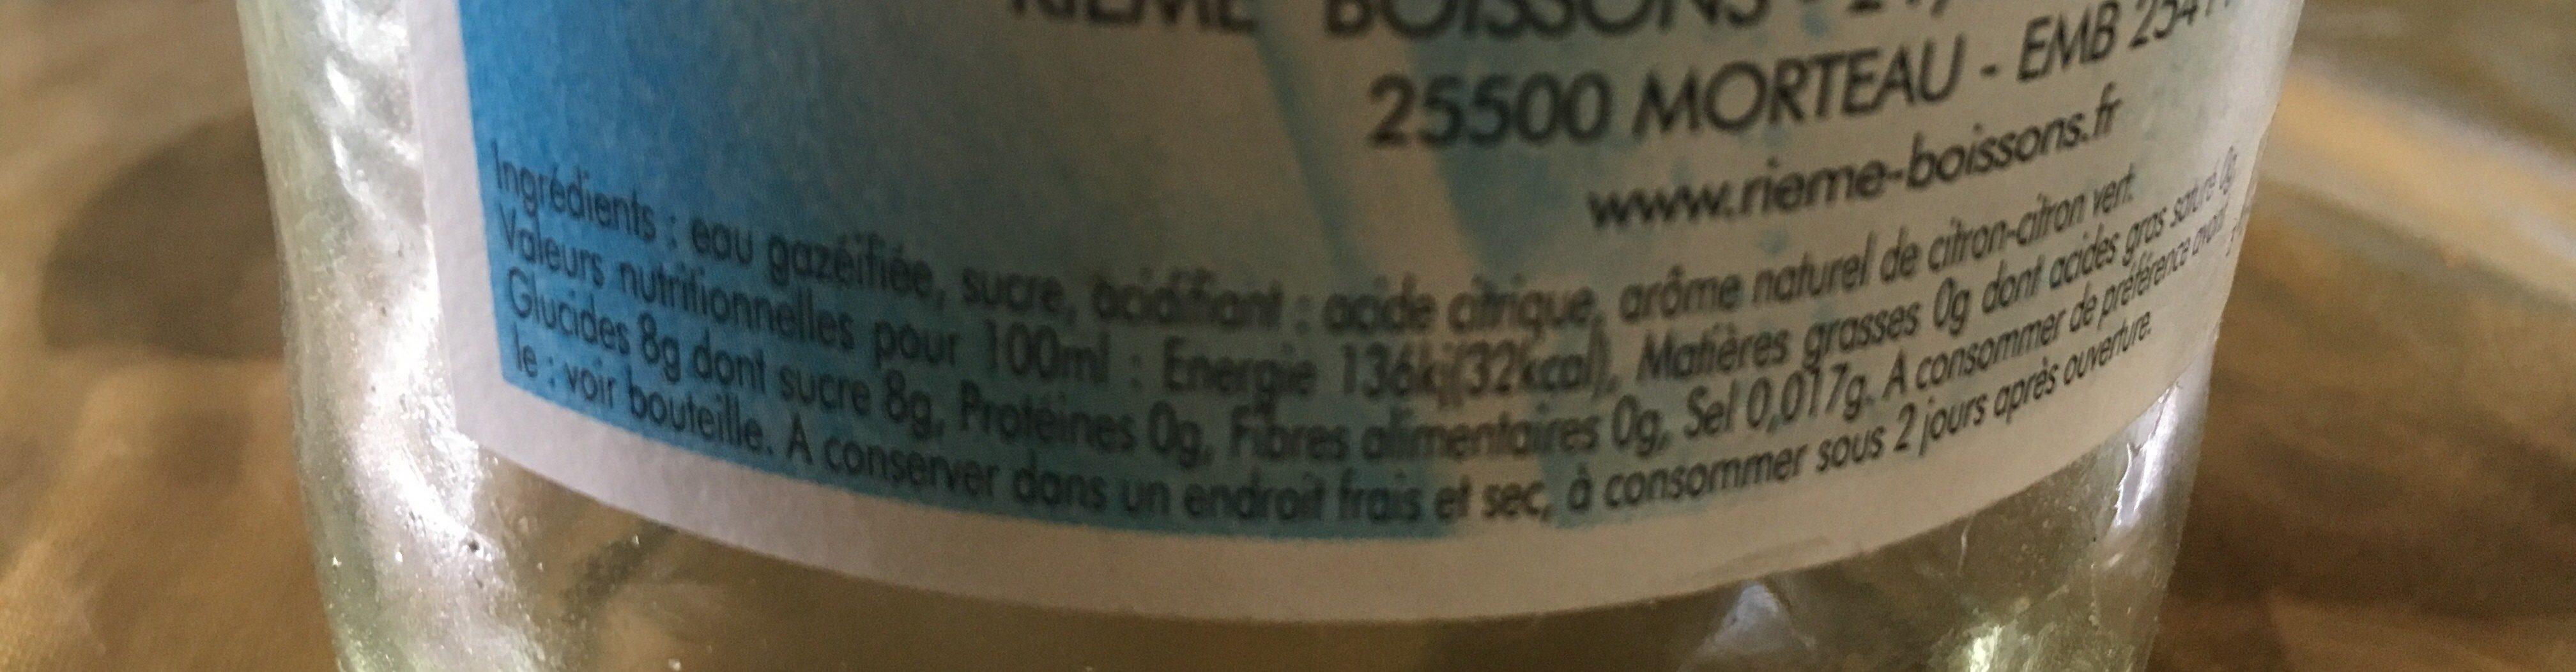 Limonade - Ingredients